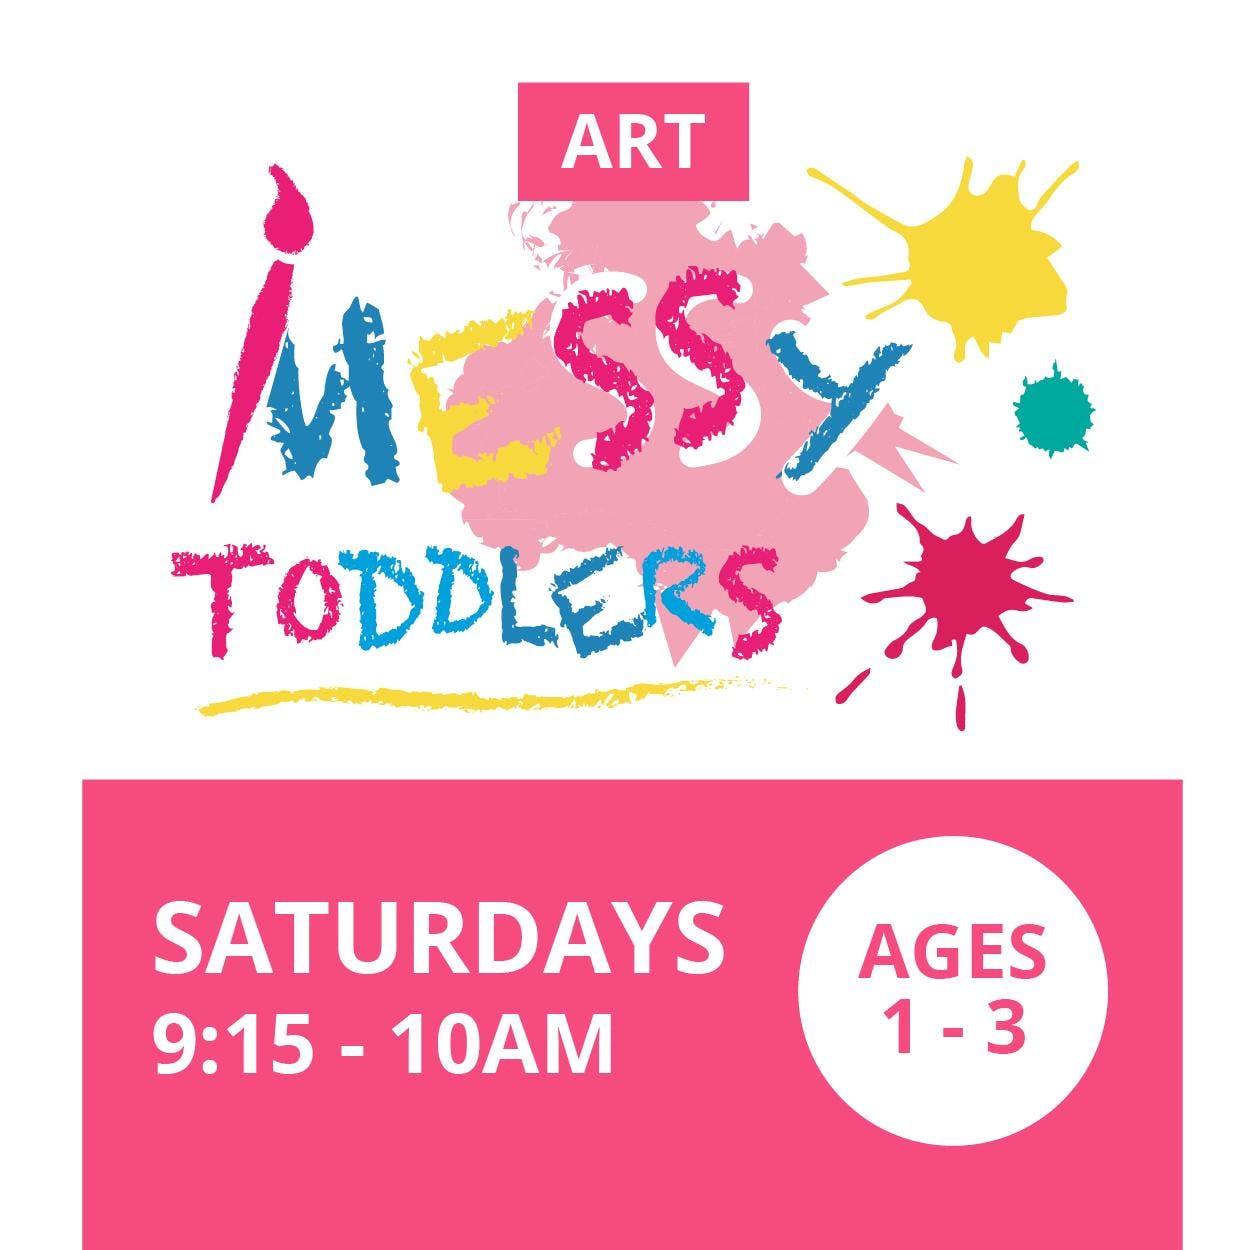 Saturday Messy Toddlers